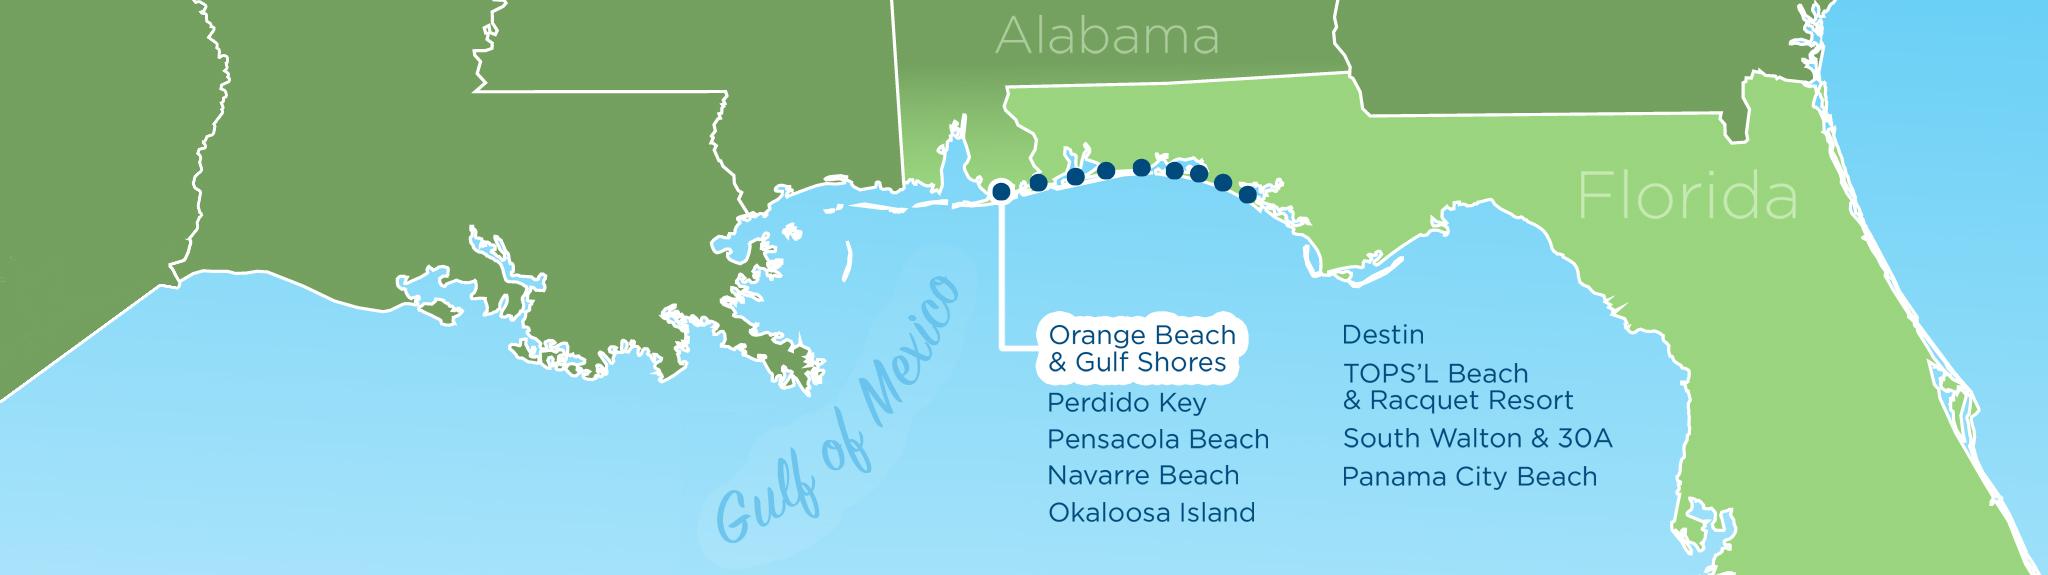 ResortQuest Real Estate NW FL  AL Gulf Coast Condos And Homes - Florida map destin beach